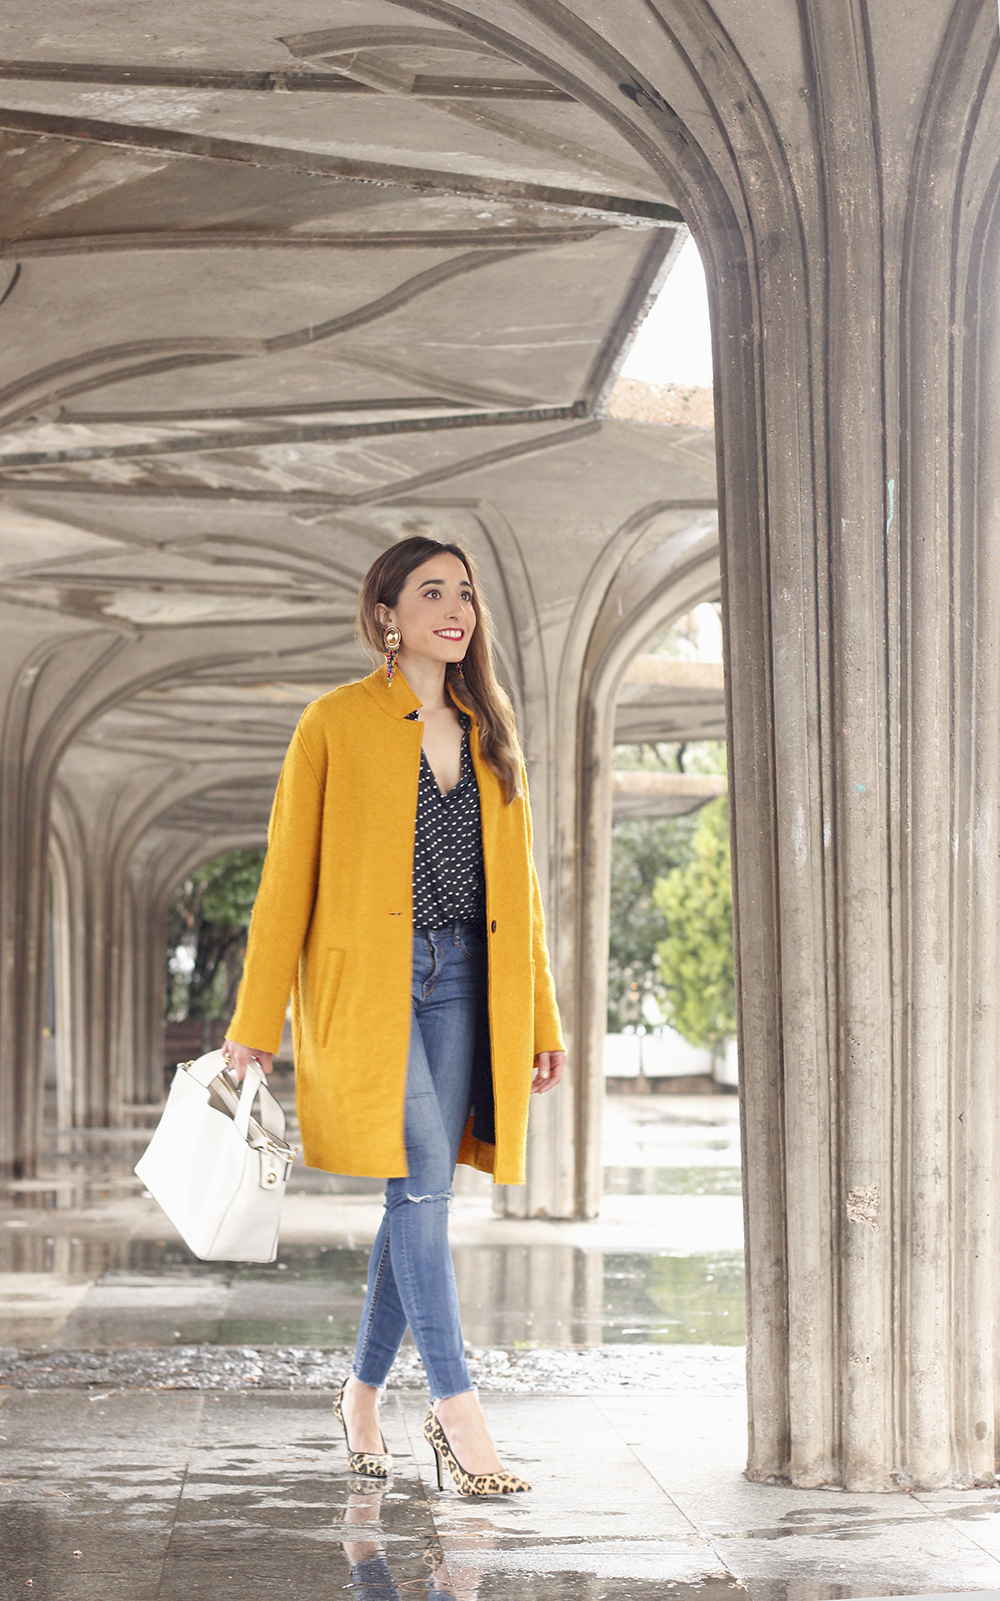 mustard coat polka dots shirt leopard heels white bag outfit 07